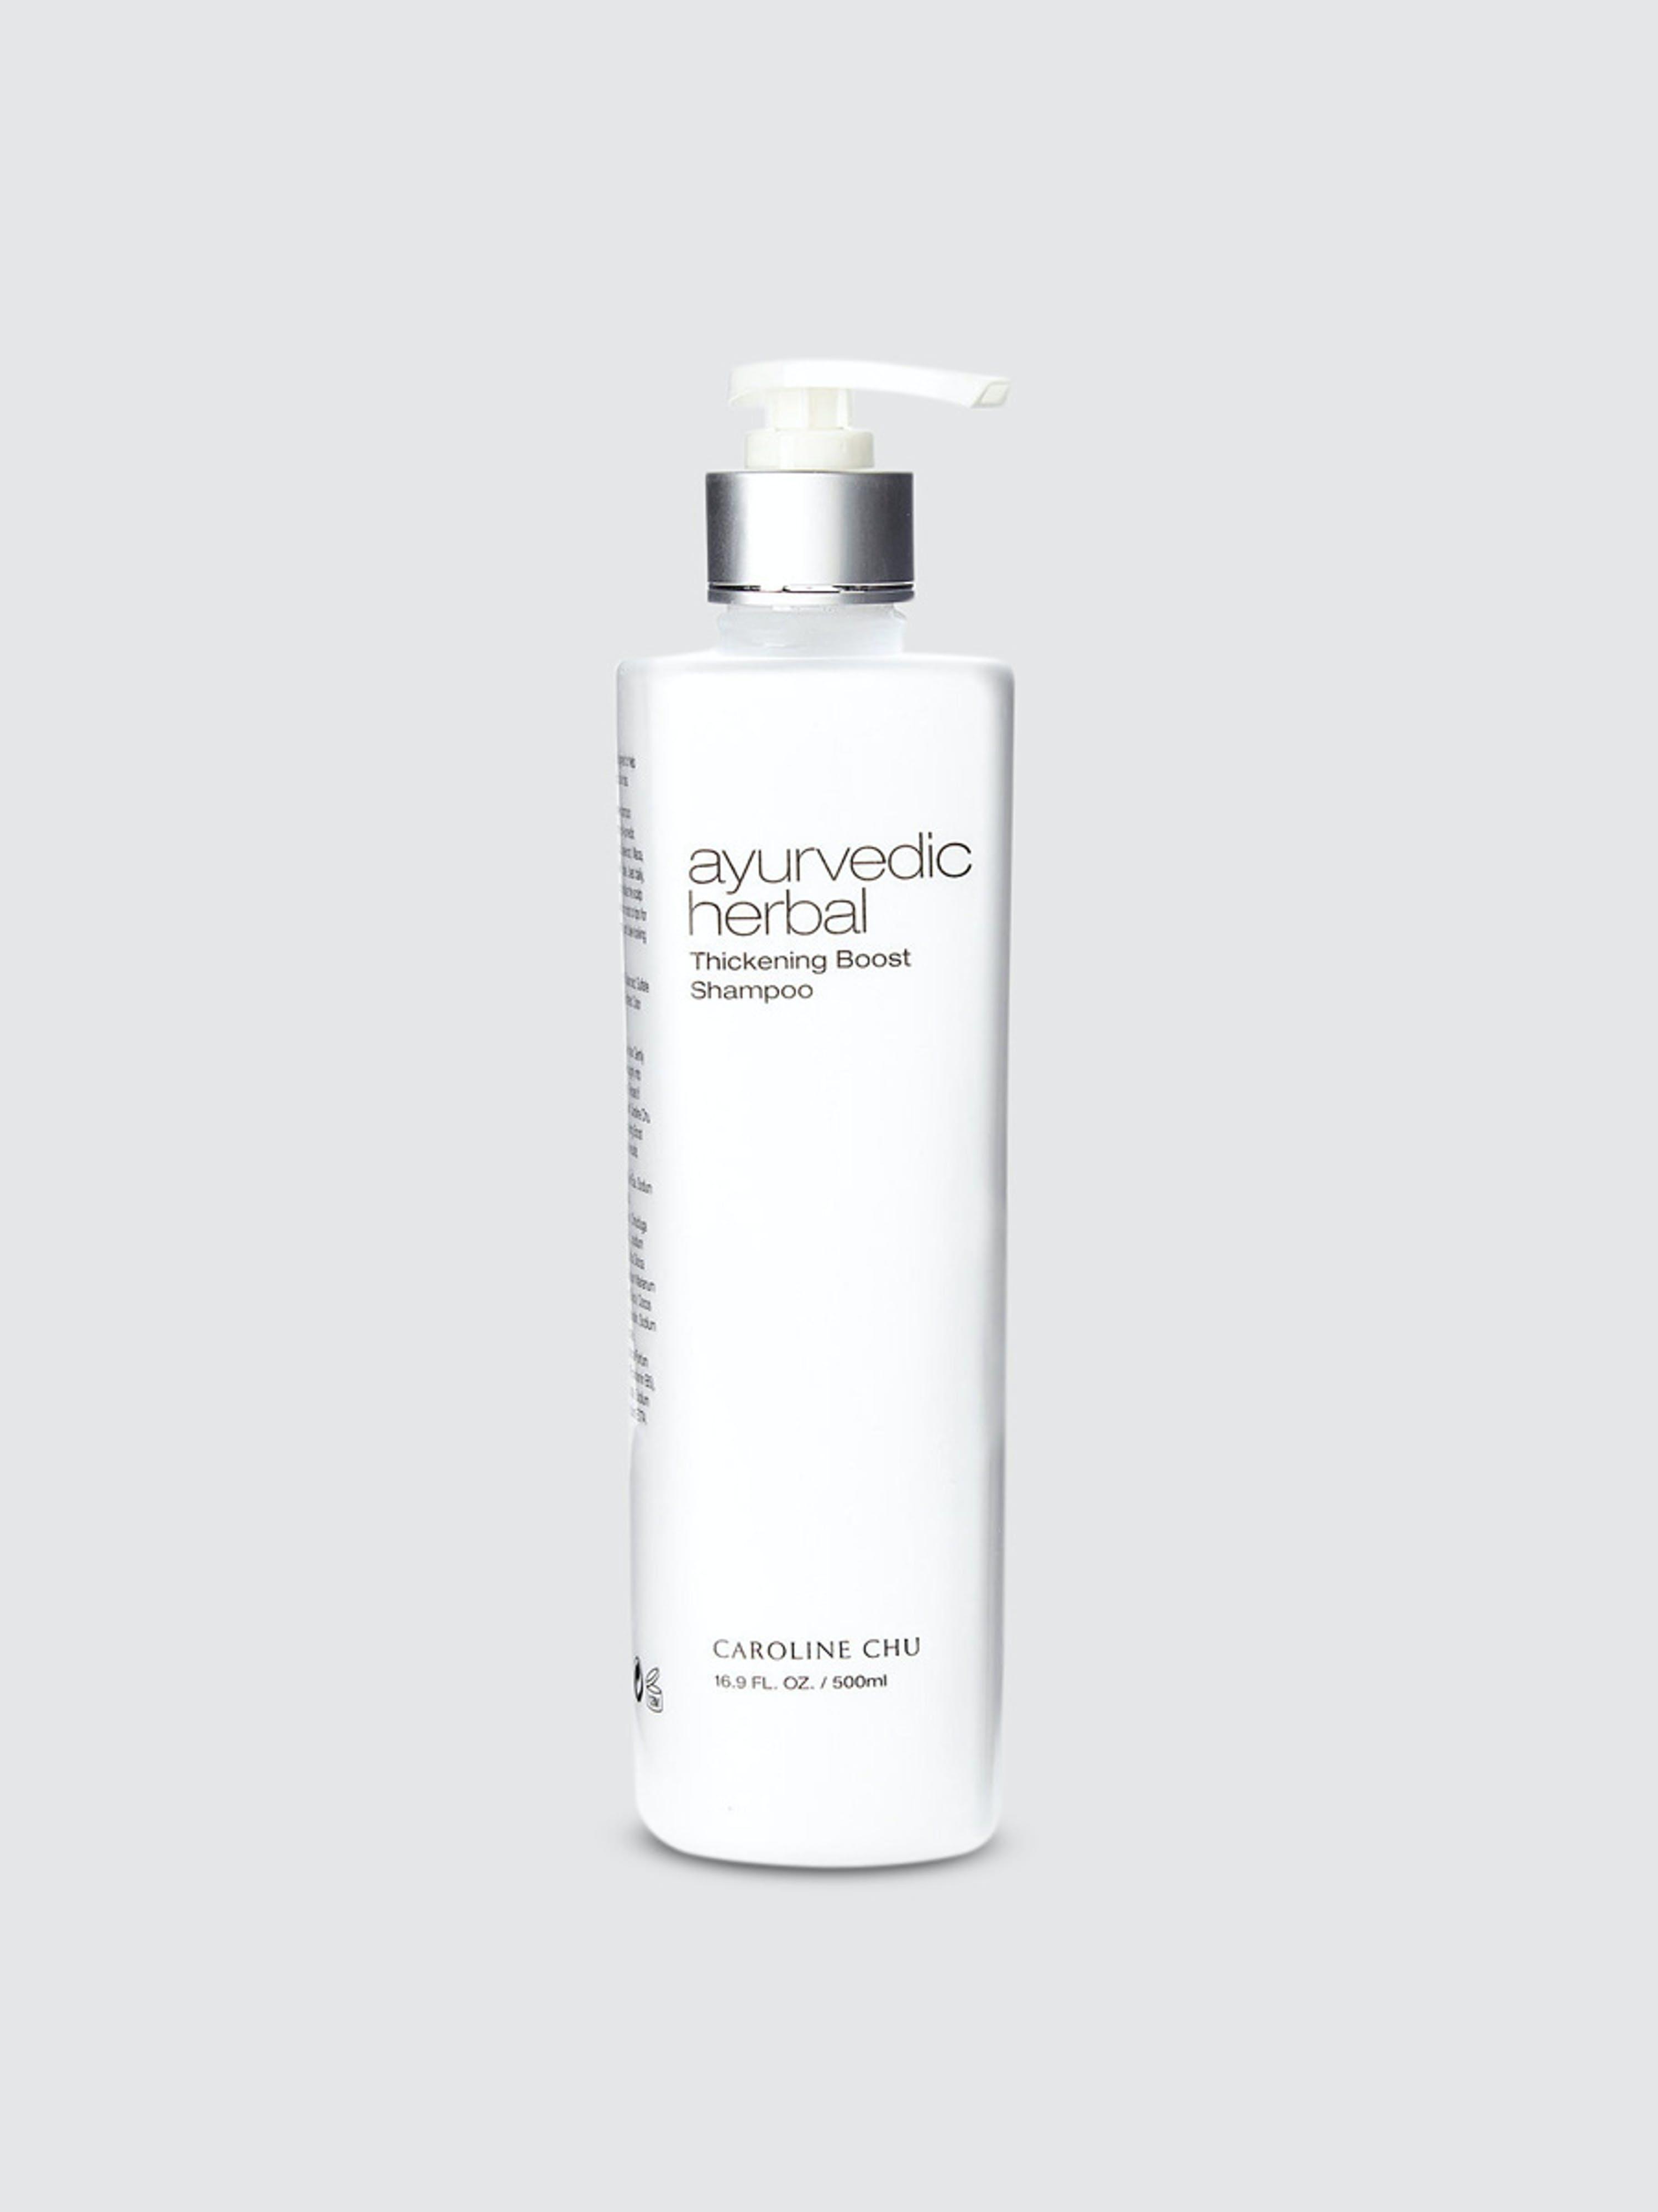 Caroline Chu Ayurvedic Herbal Thickening Boost Shampoo